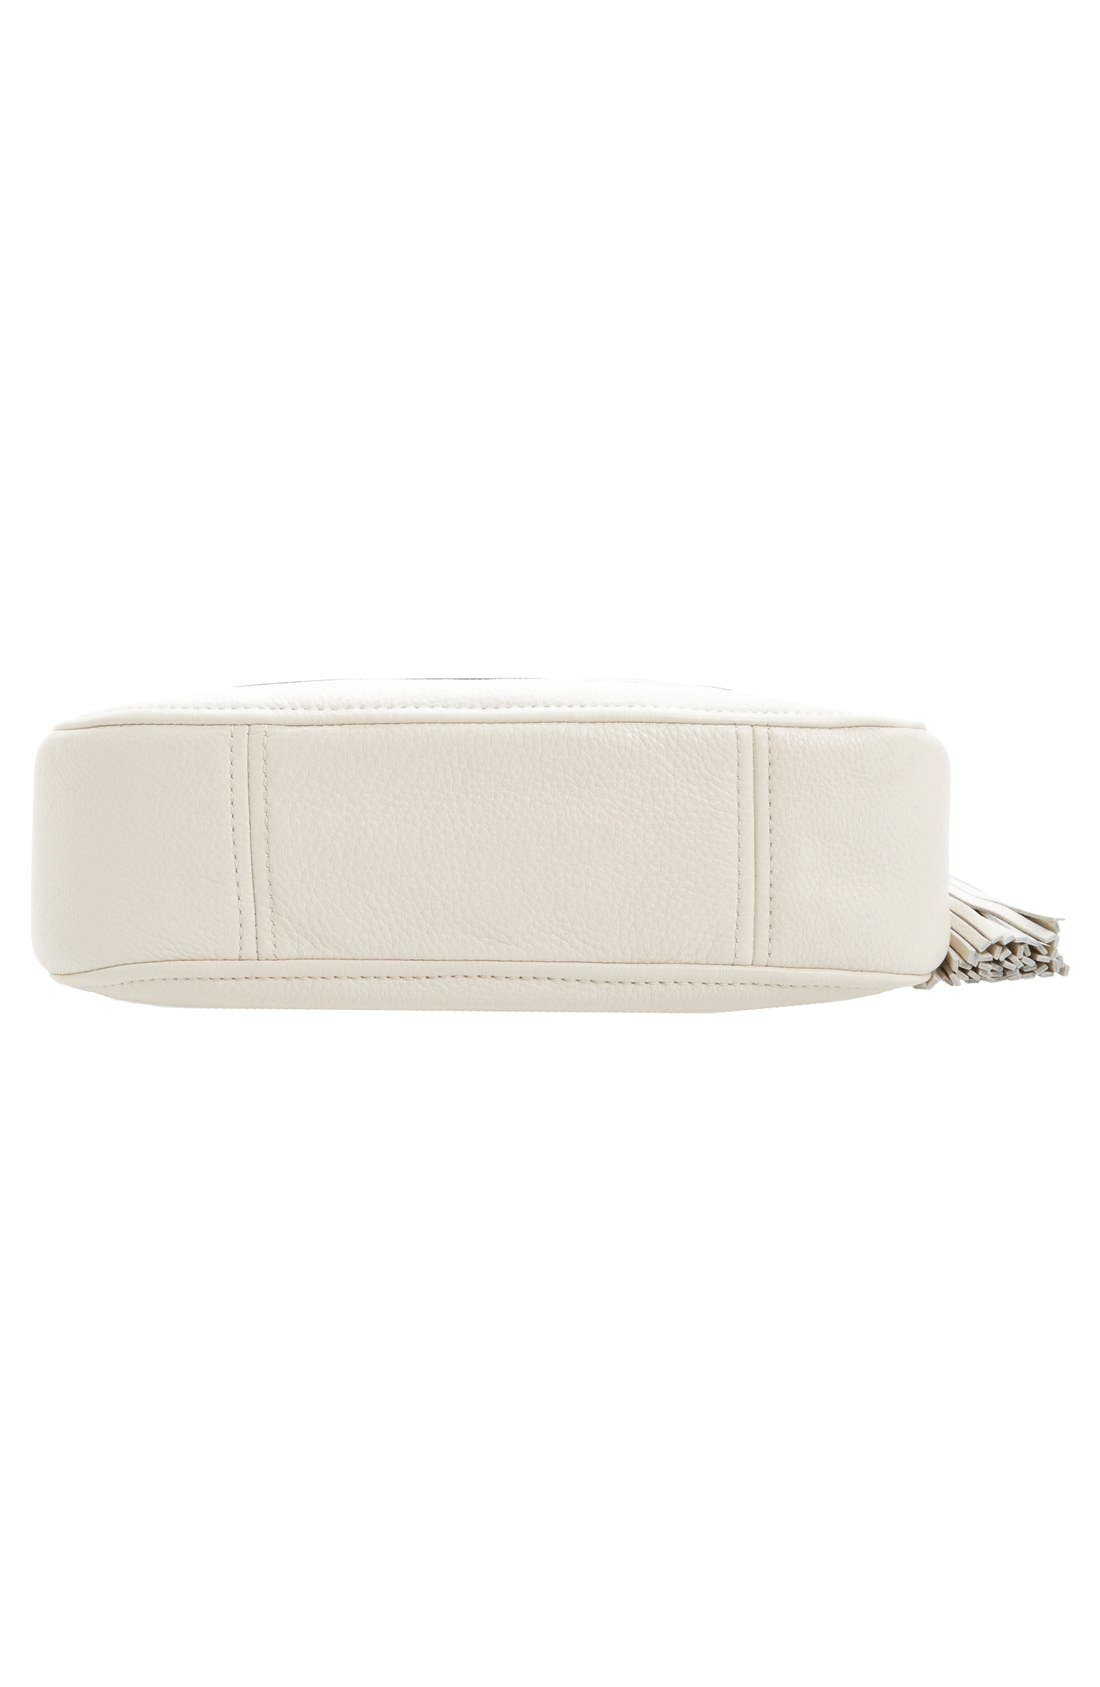 ,                             'Bedford Tassel - Medium' Convertible Leather Shoulder Bag,                             Alternate thumbnail 55, color,                             901